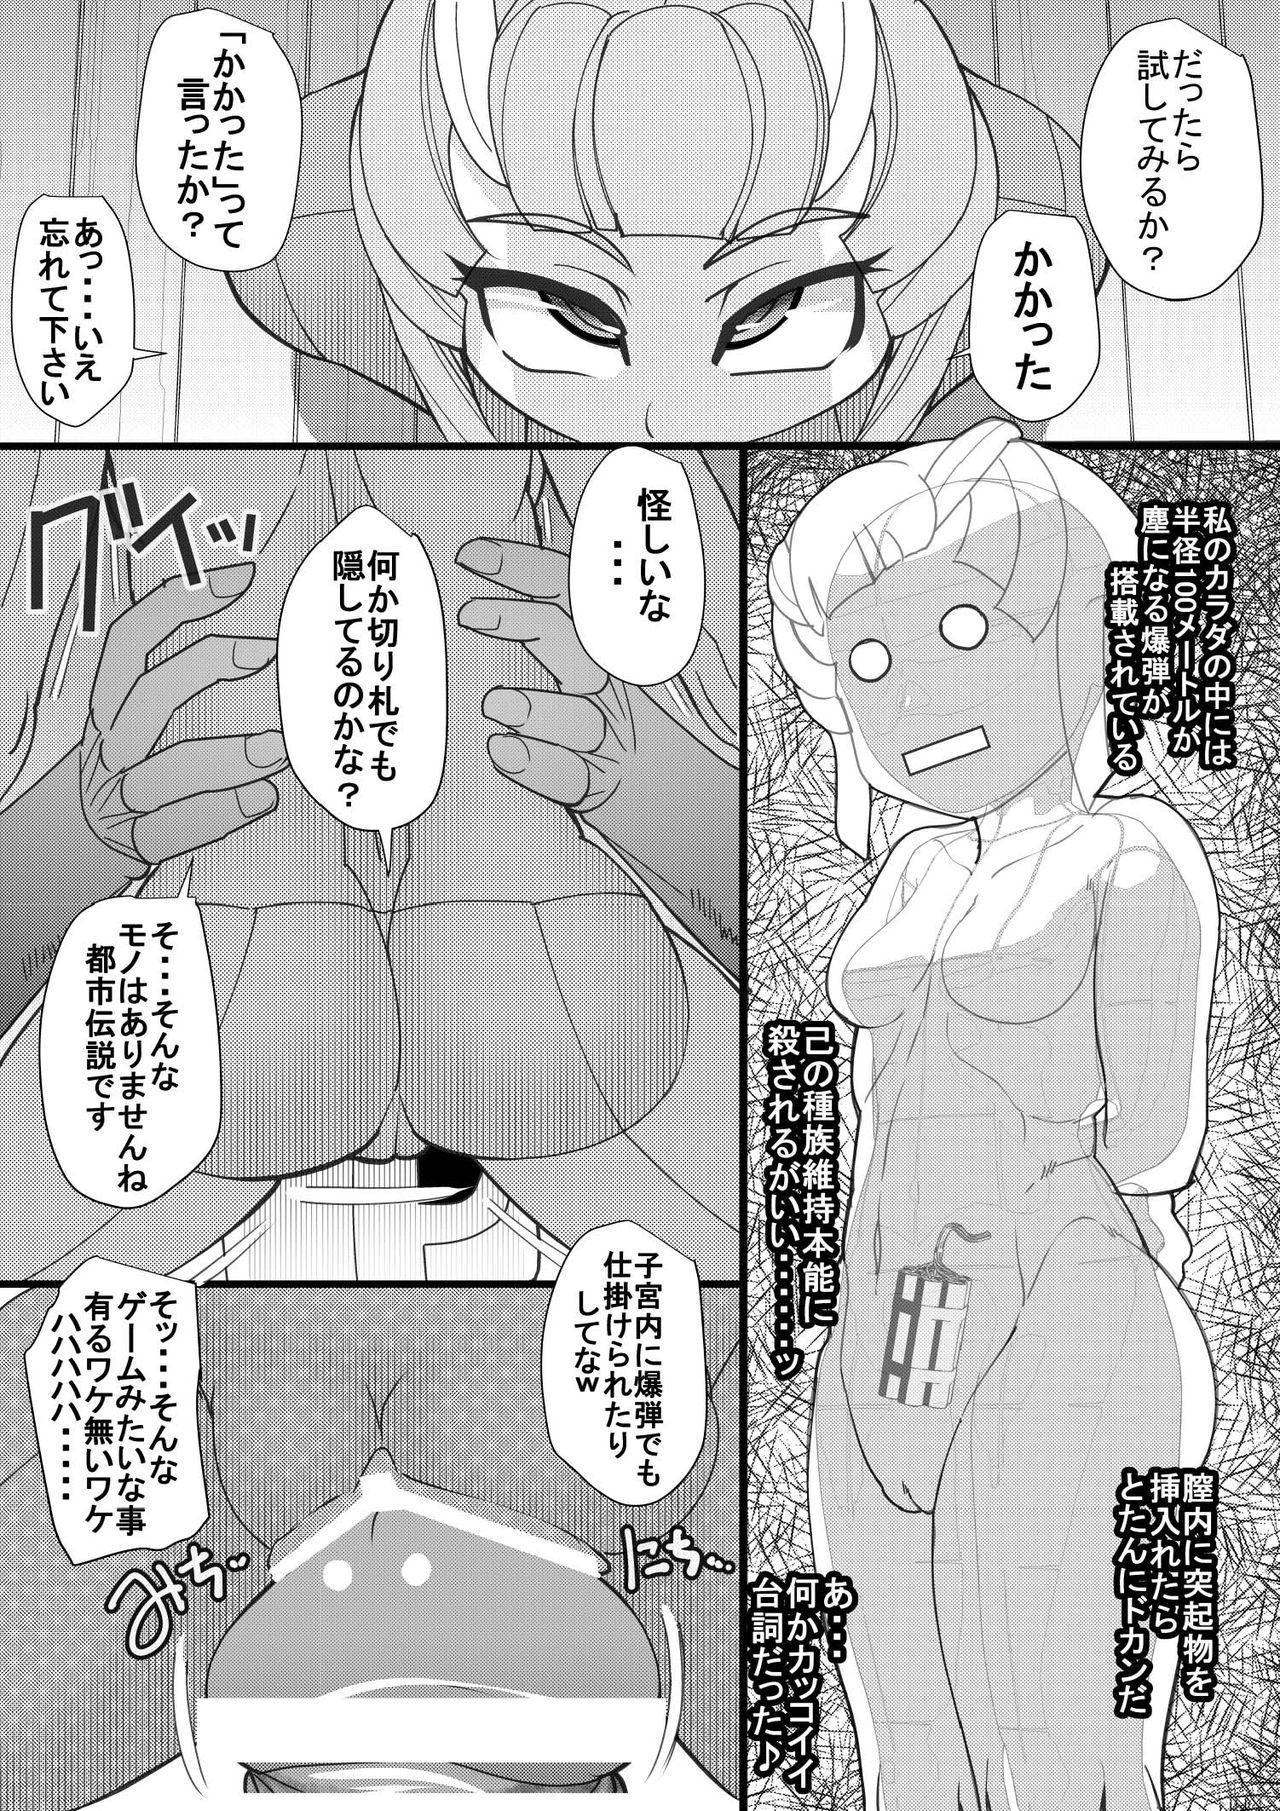 Haramachi 8 11